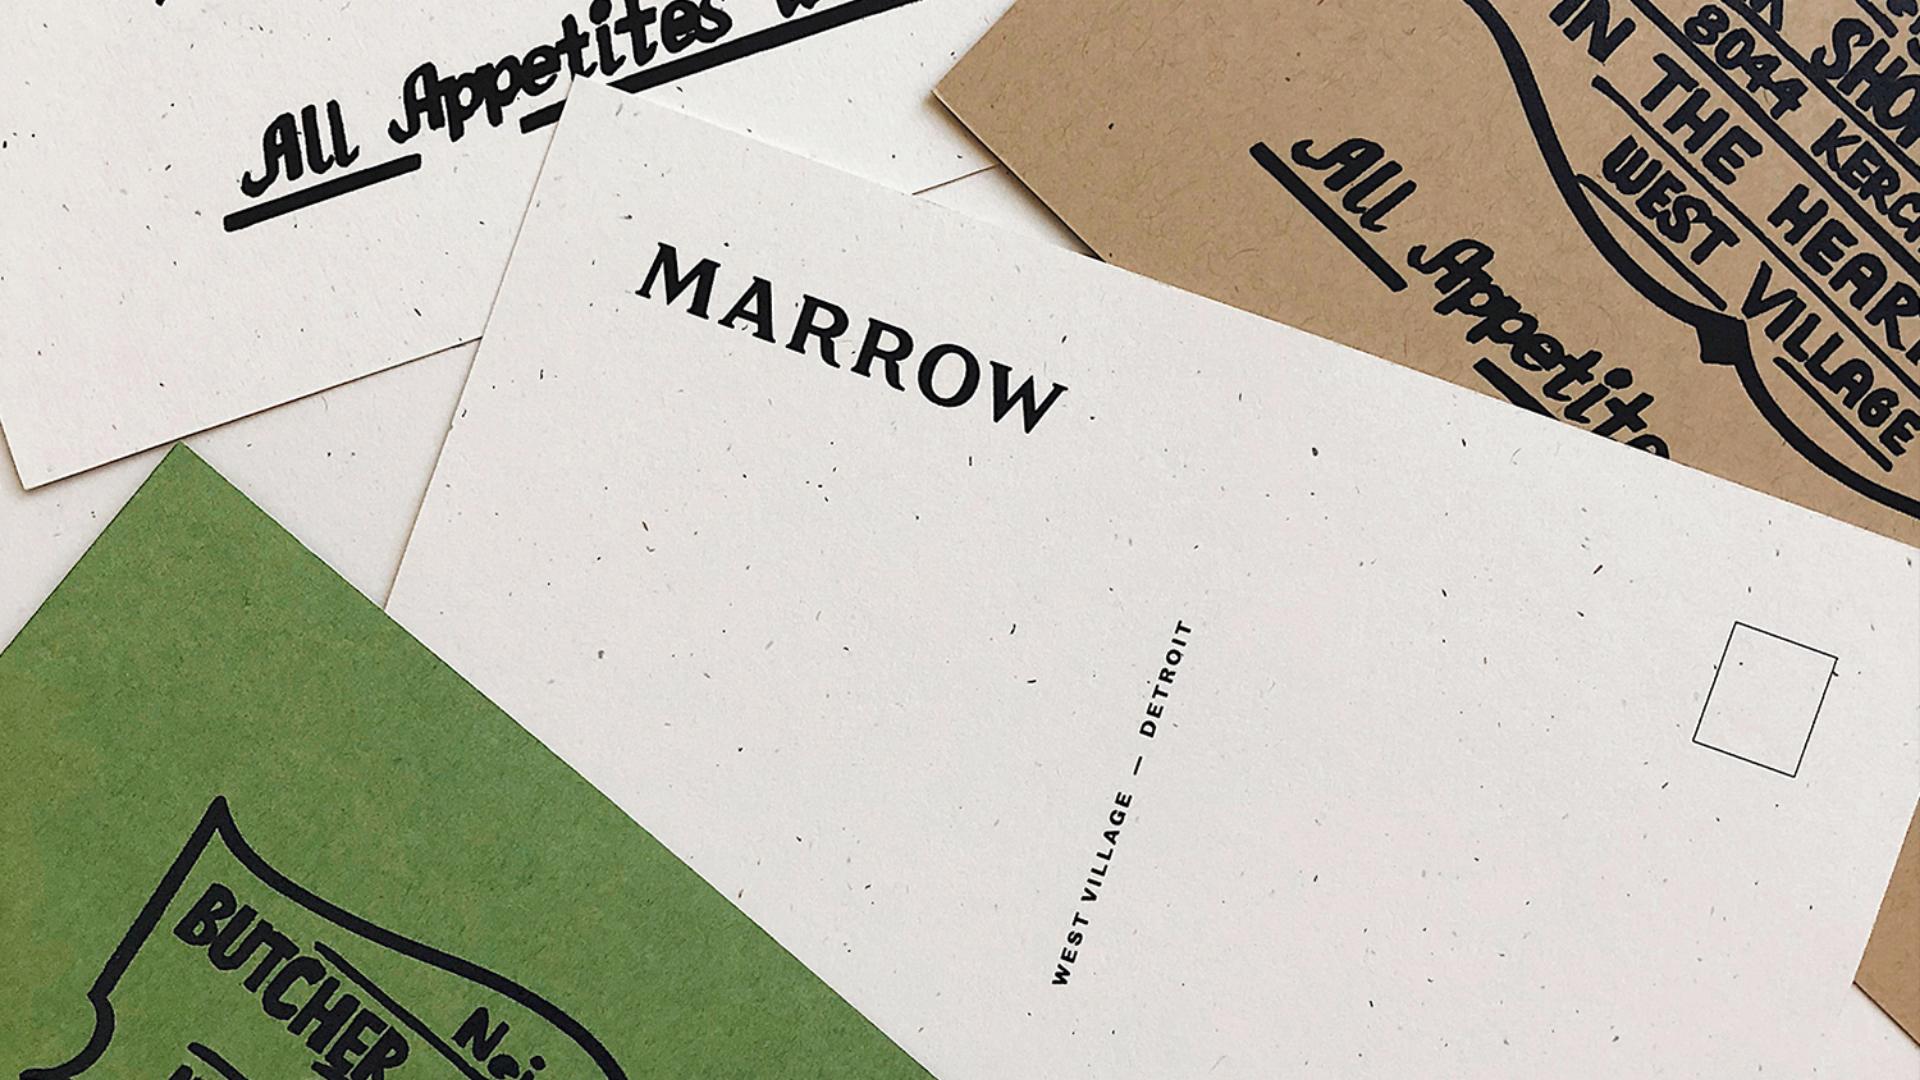 Marrow_4.jpg